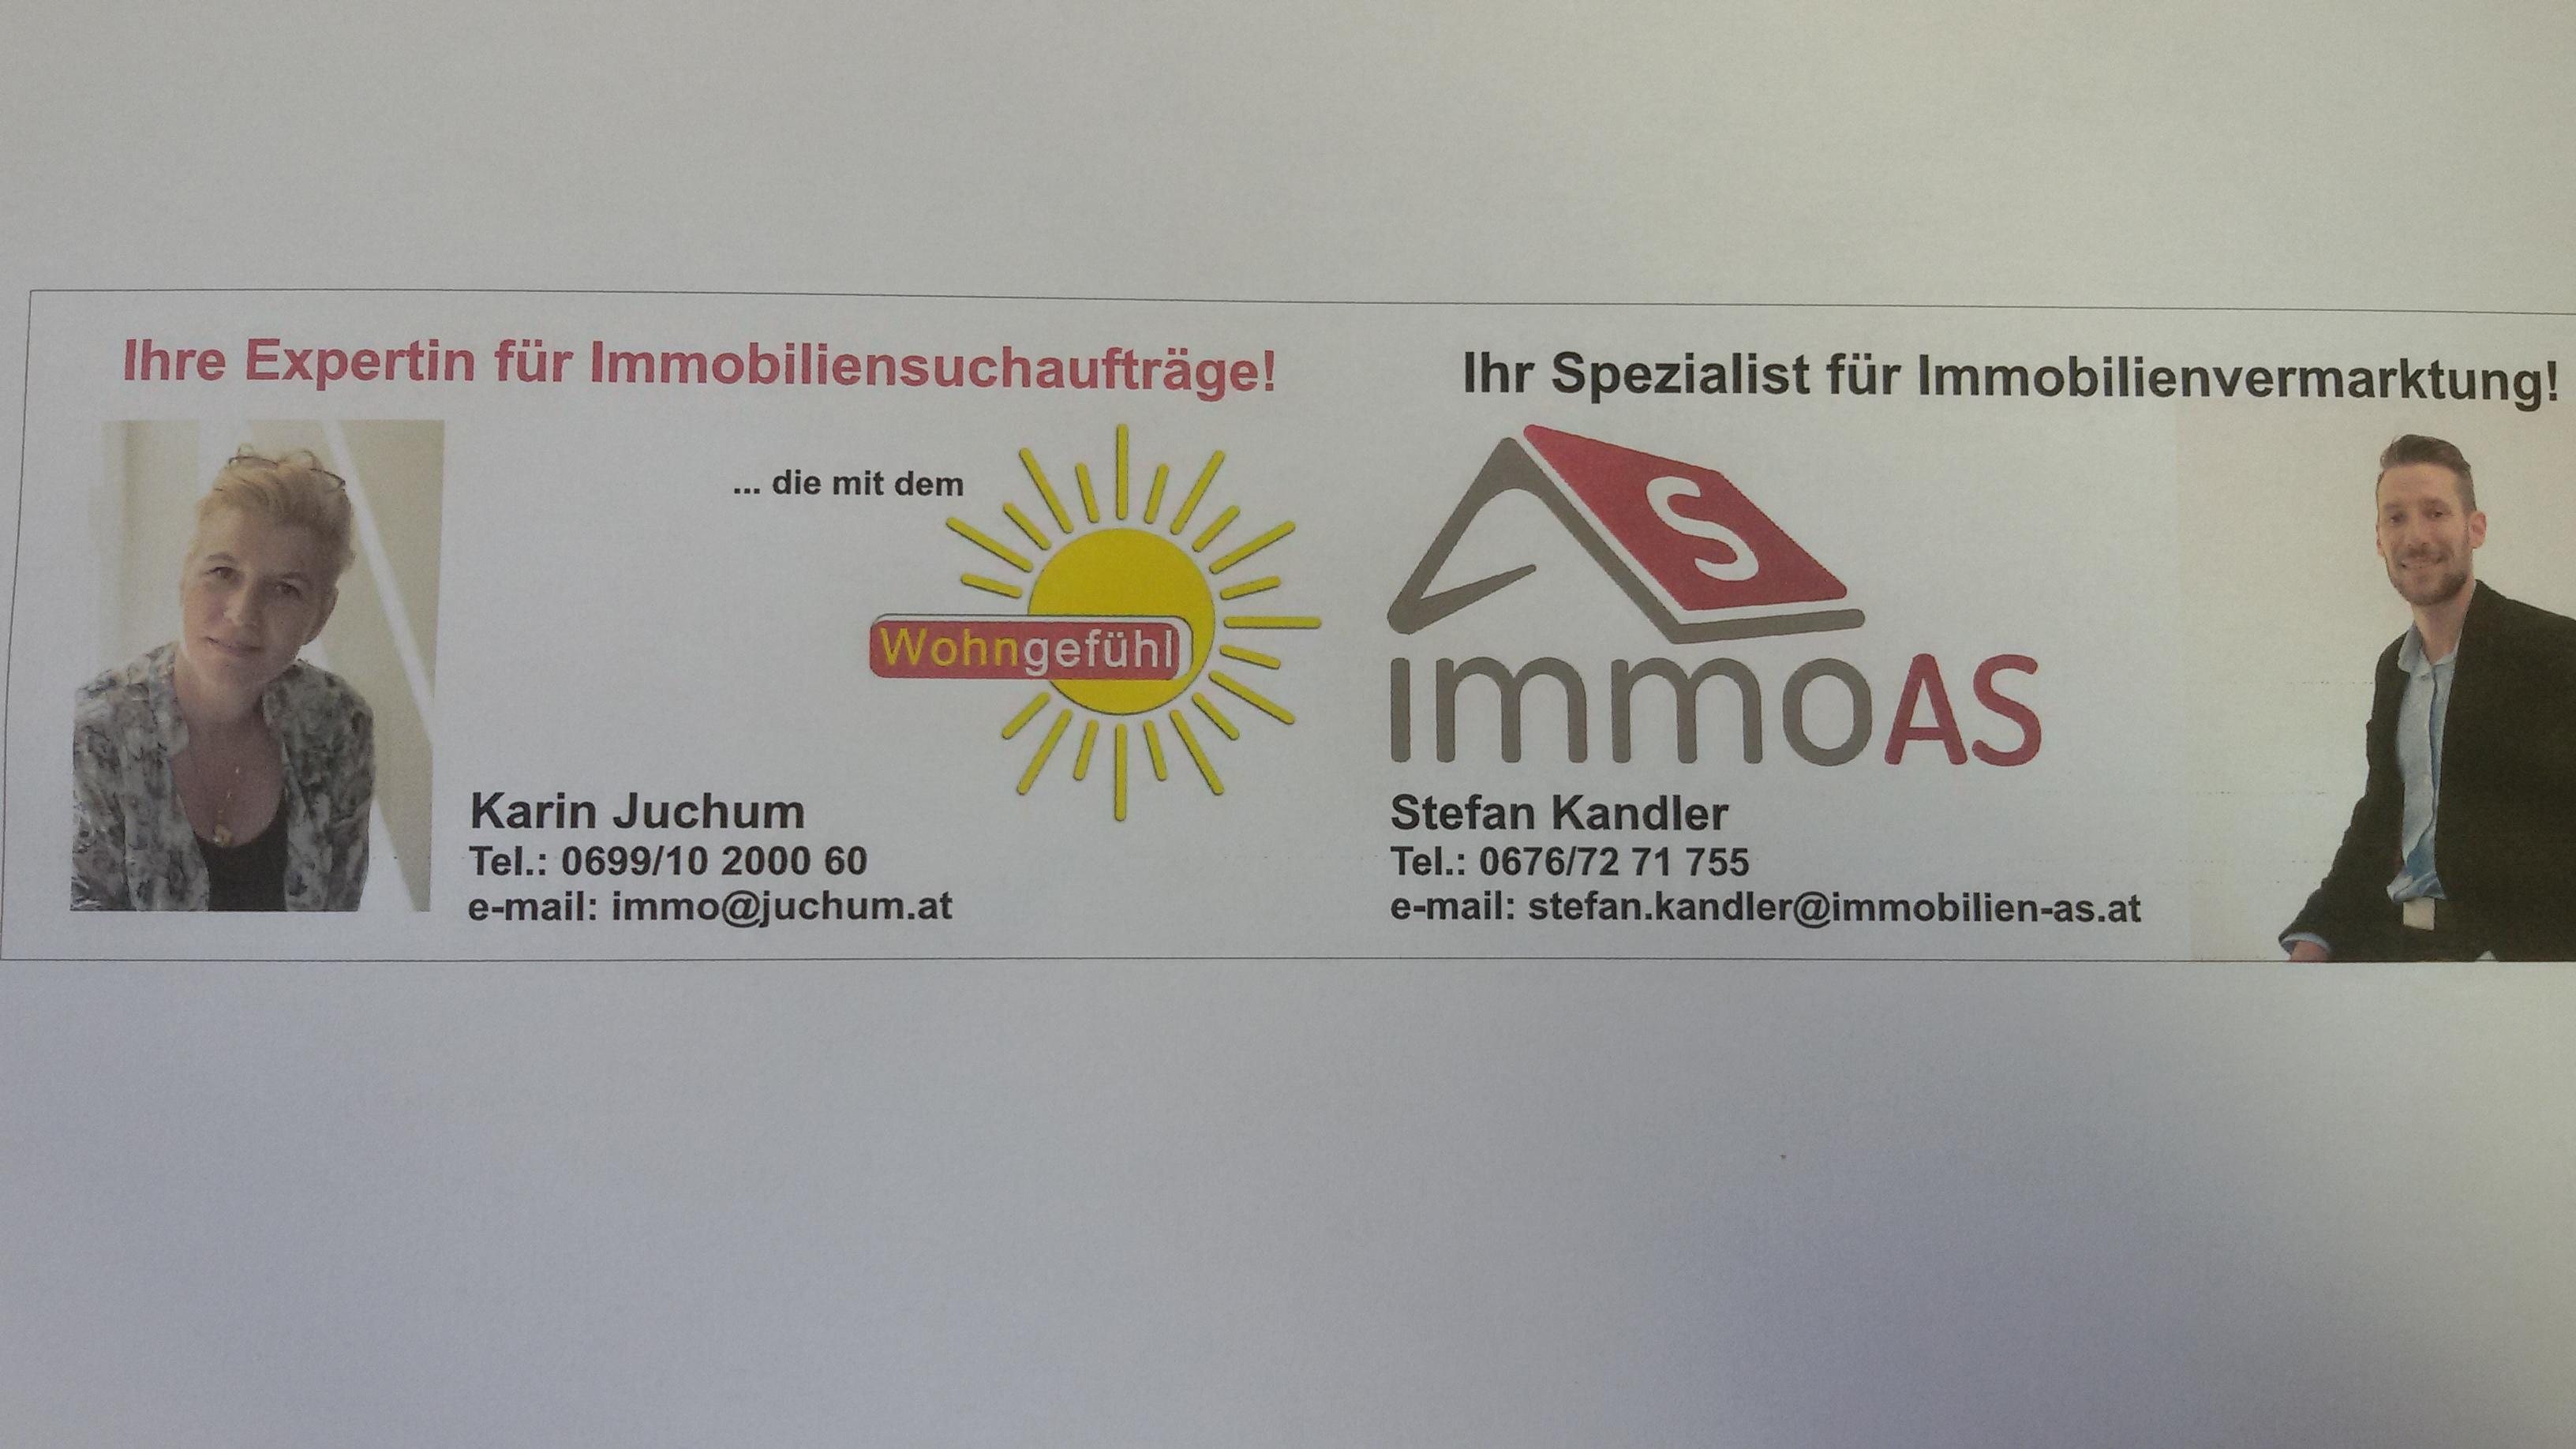 Immoas - Sponsor 2016-Homepage